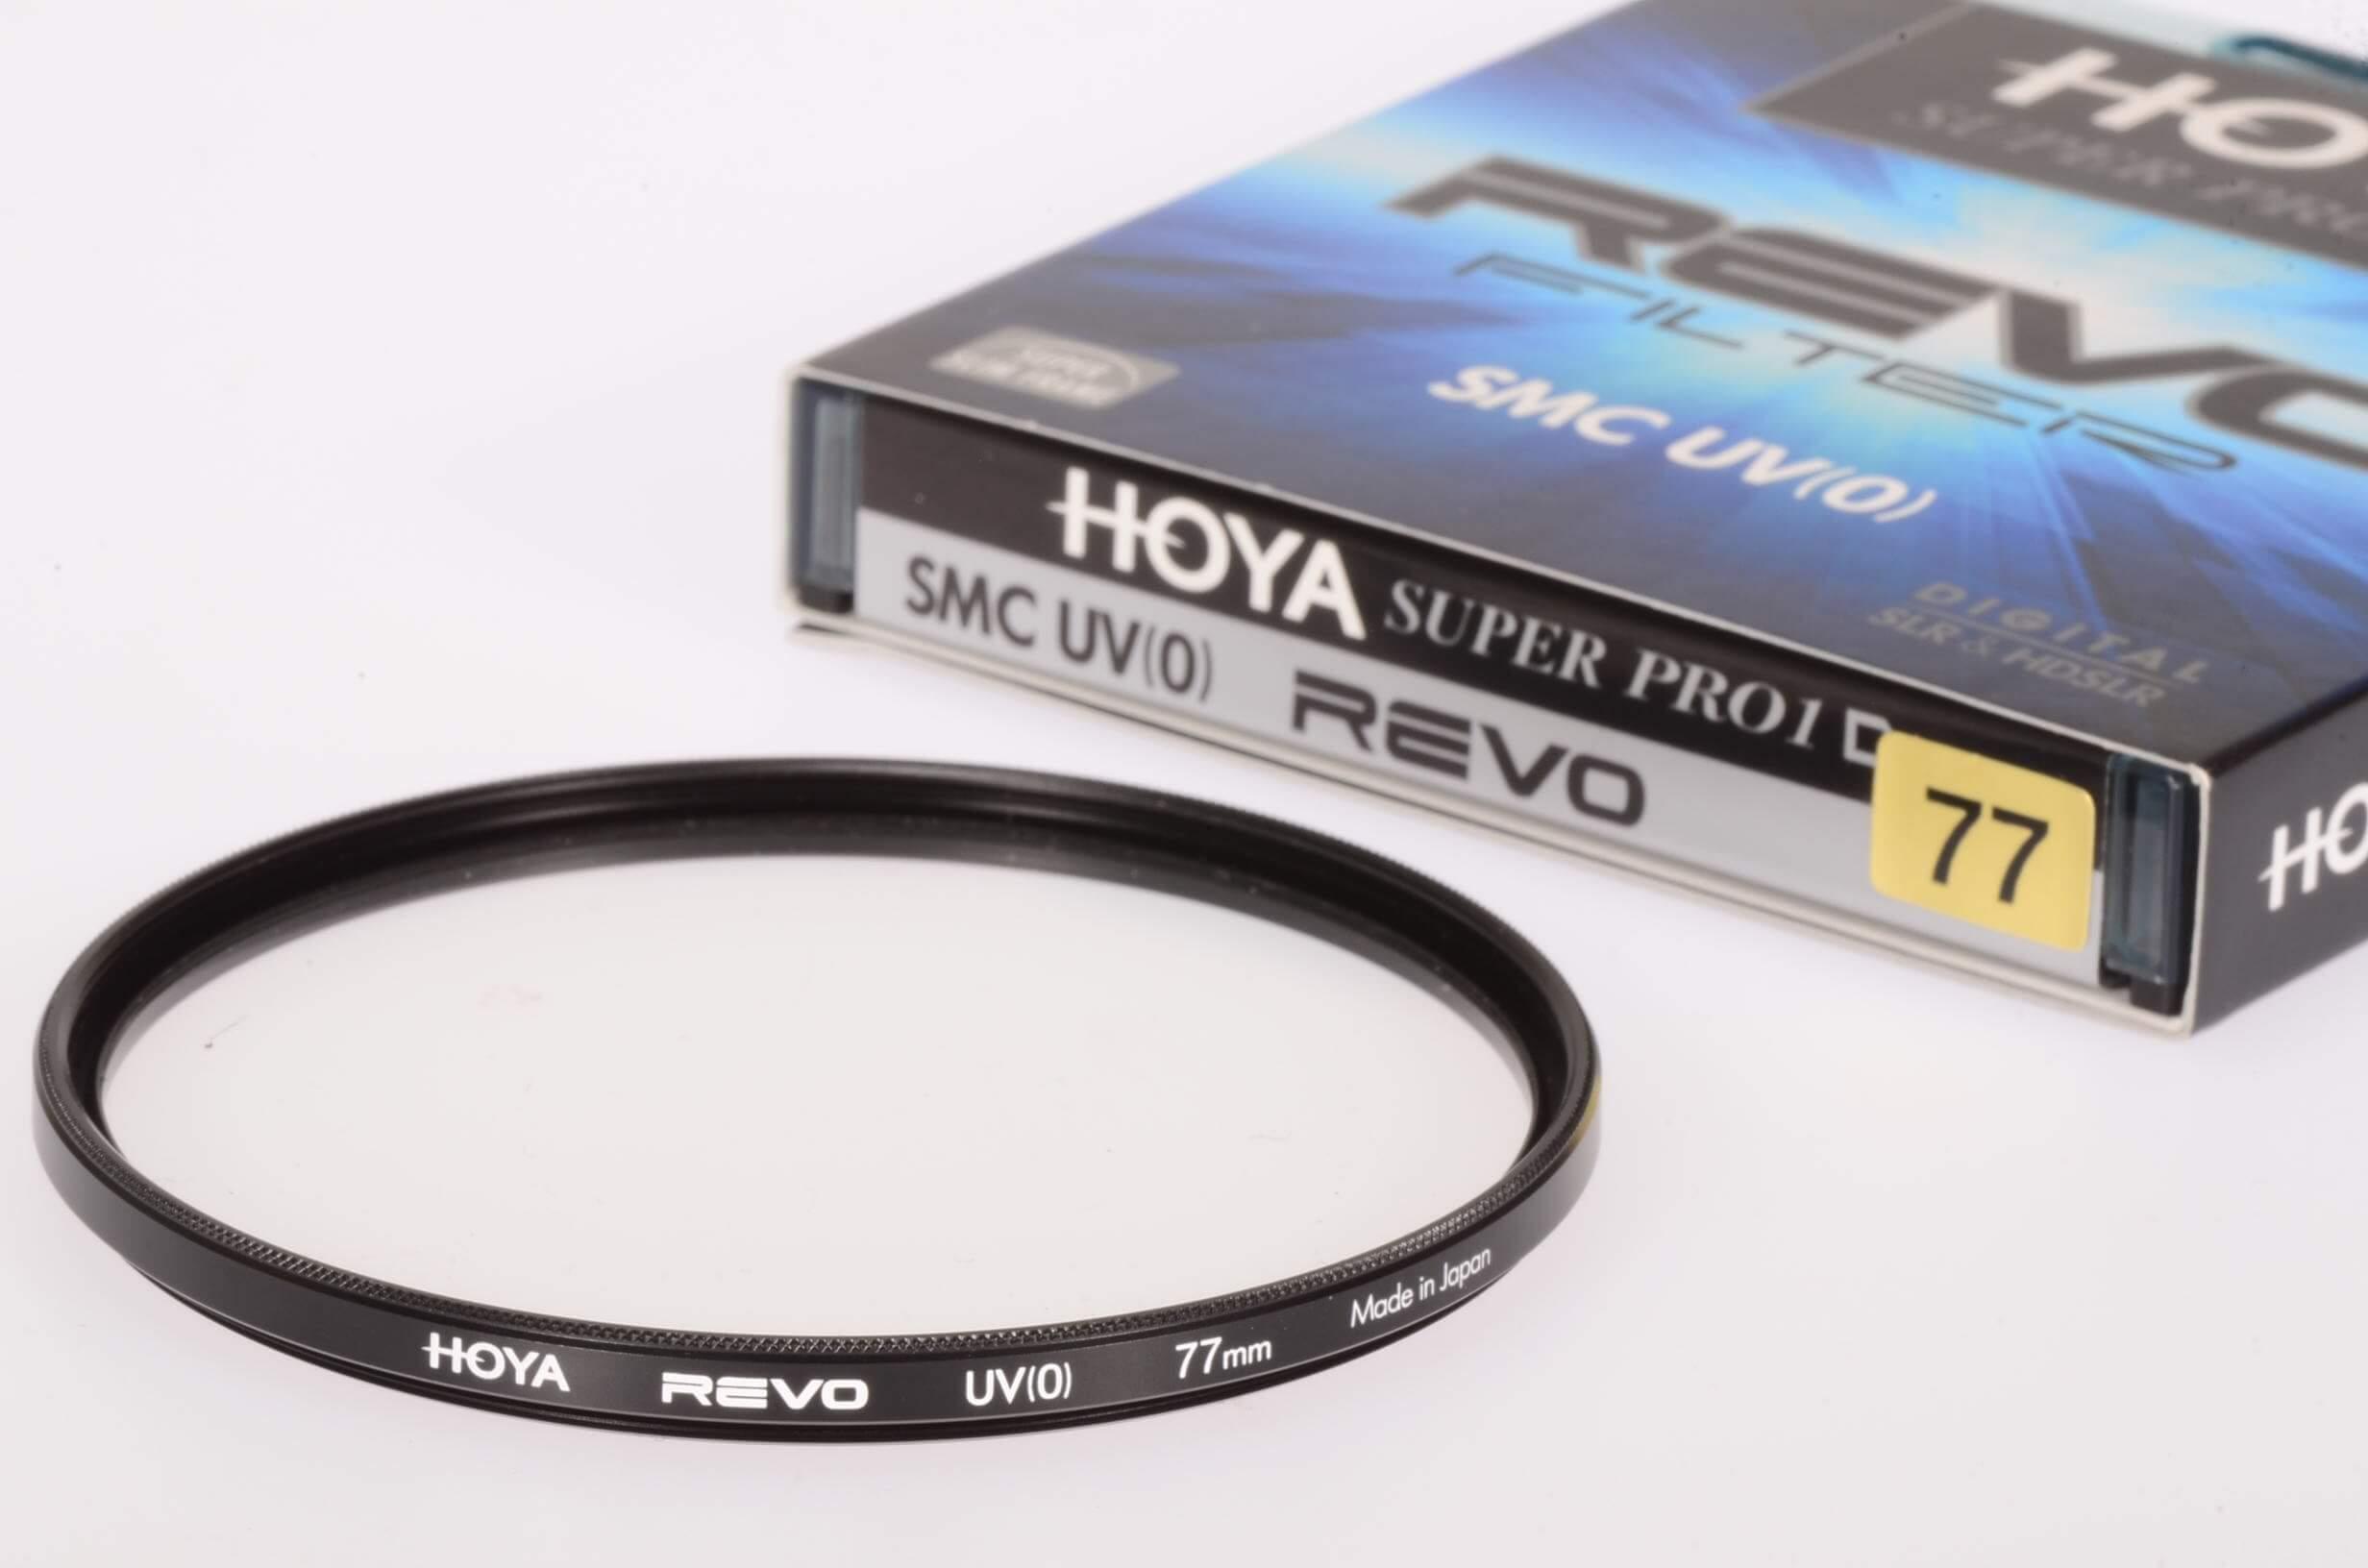 Hoya 77mm REVO SMC UV filter, mint and boxed!